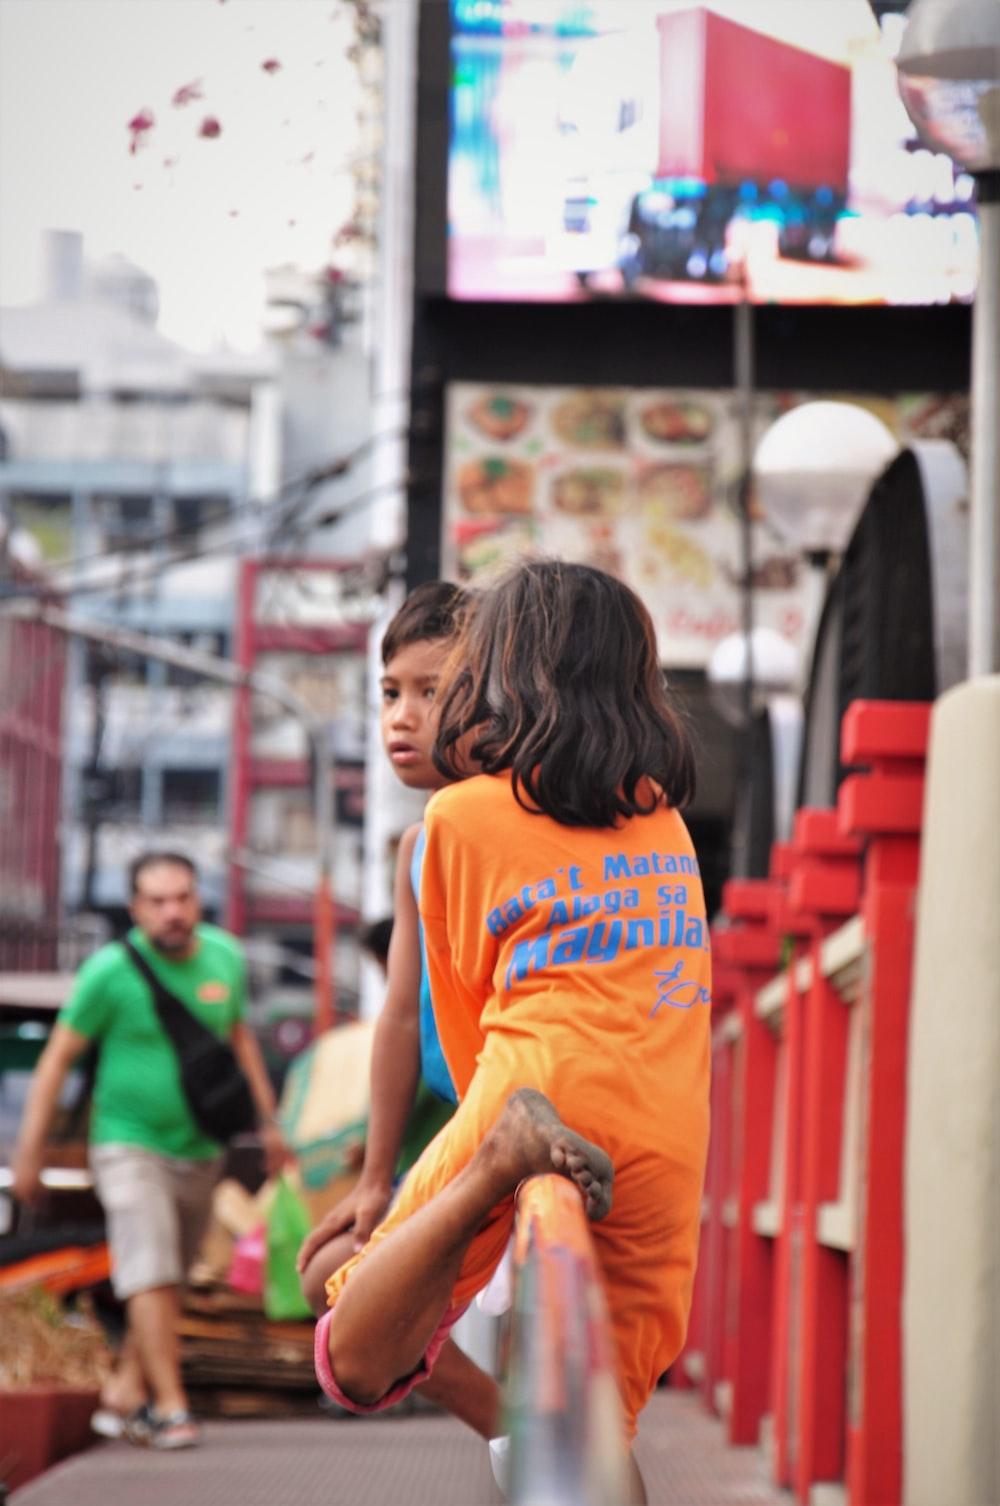 woman in orange crew neck t-shirt sitting on brown wooden bench during daytime